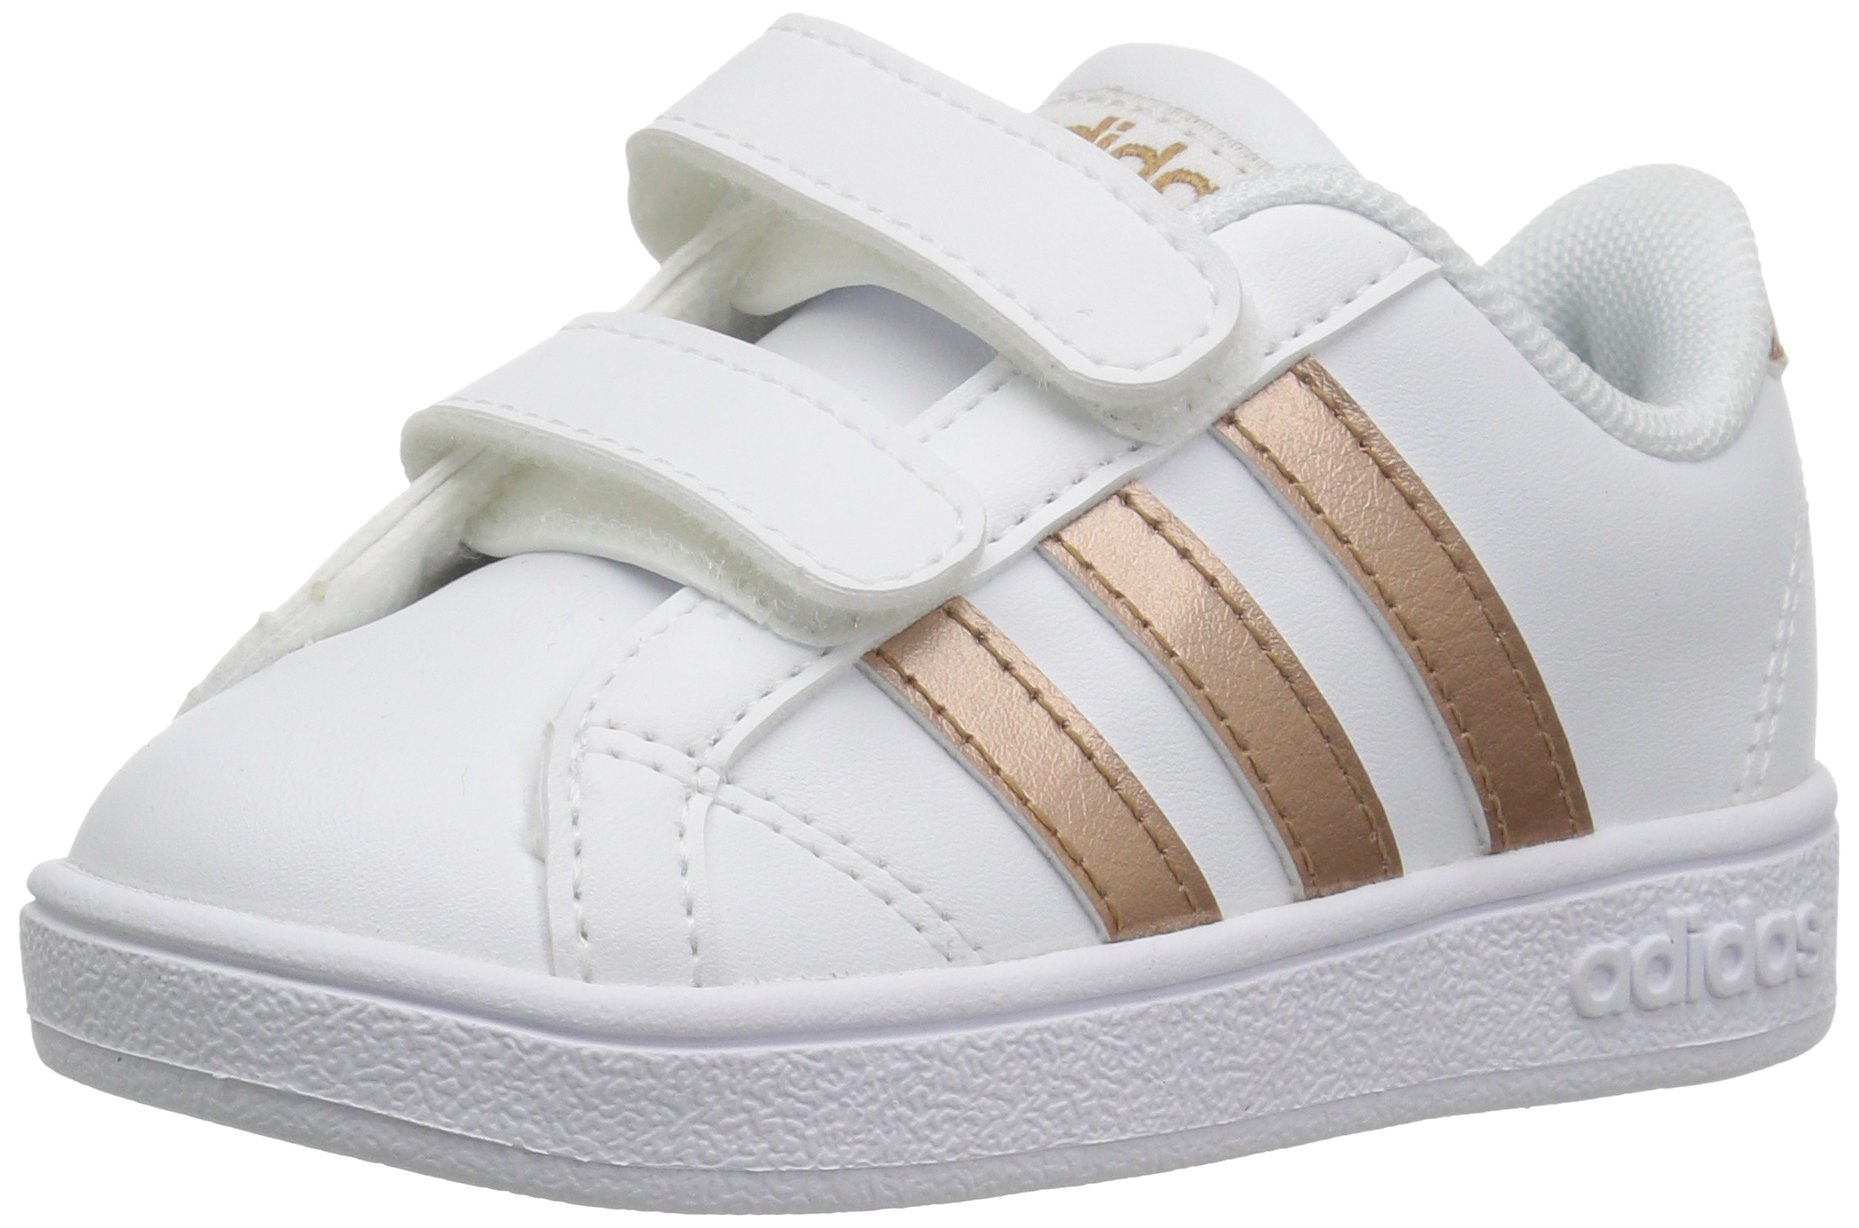 adidas Performance Baby Baseline, White/Copper Metallic/Black, 6K M US Toddler by adidas (Image #1)